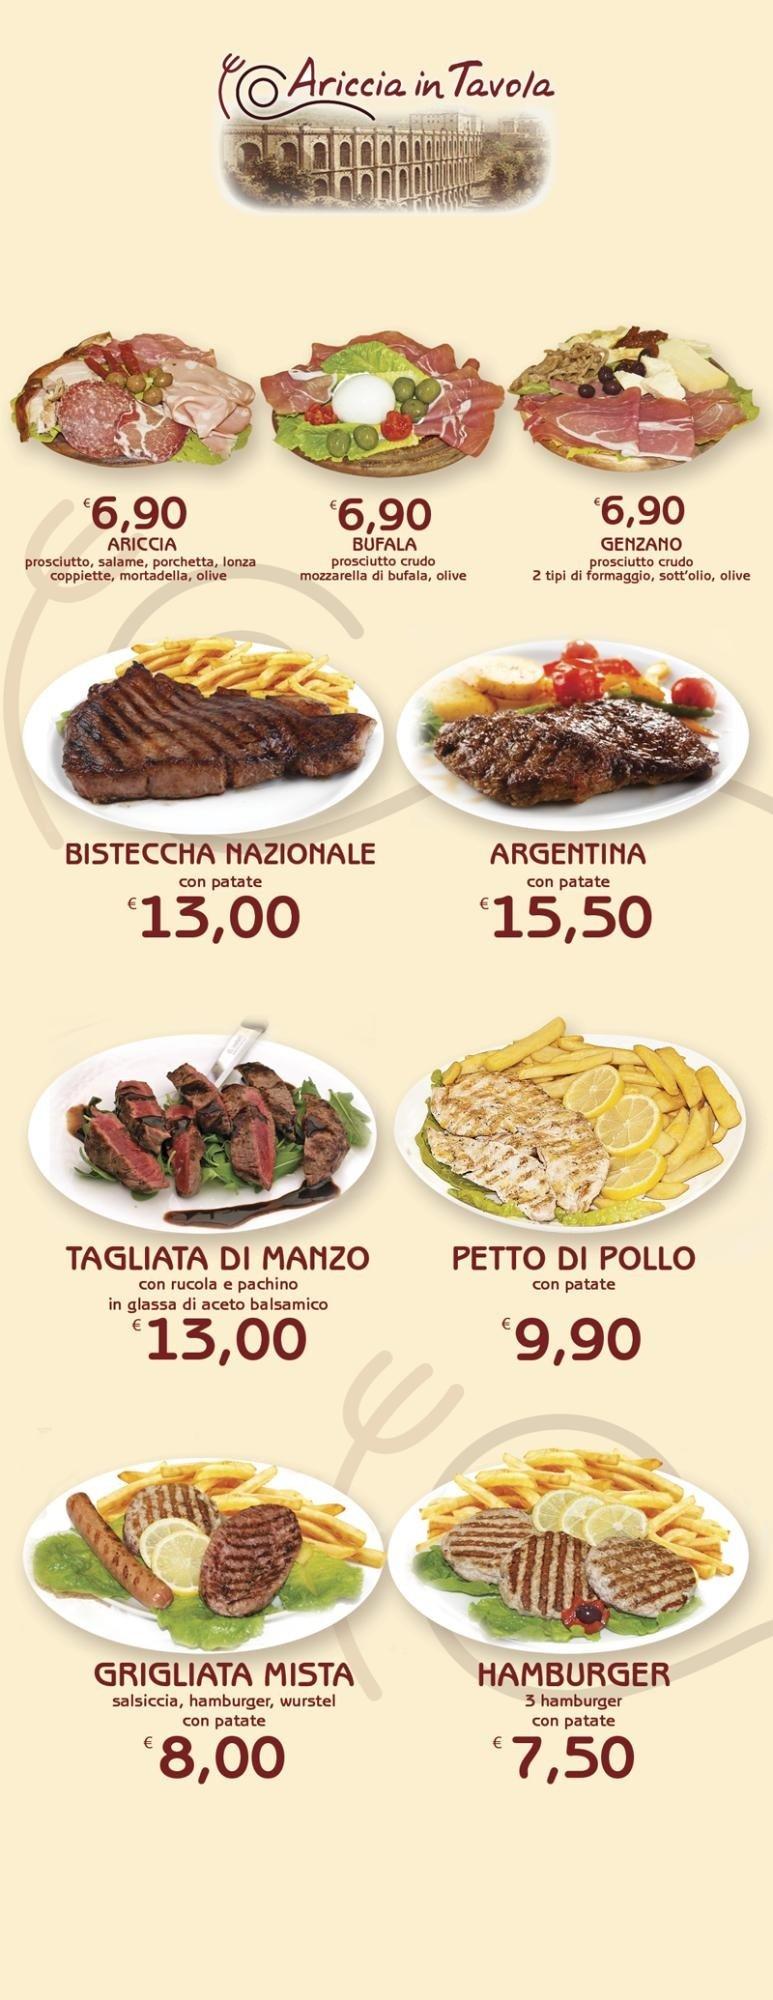 Menu' carne alla griglia Ariccia in Tavola Aprilia